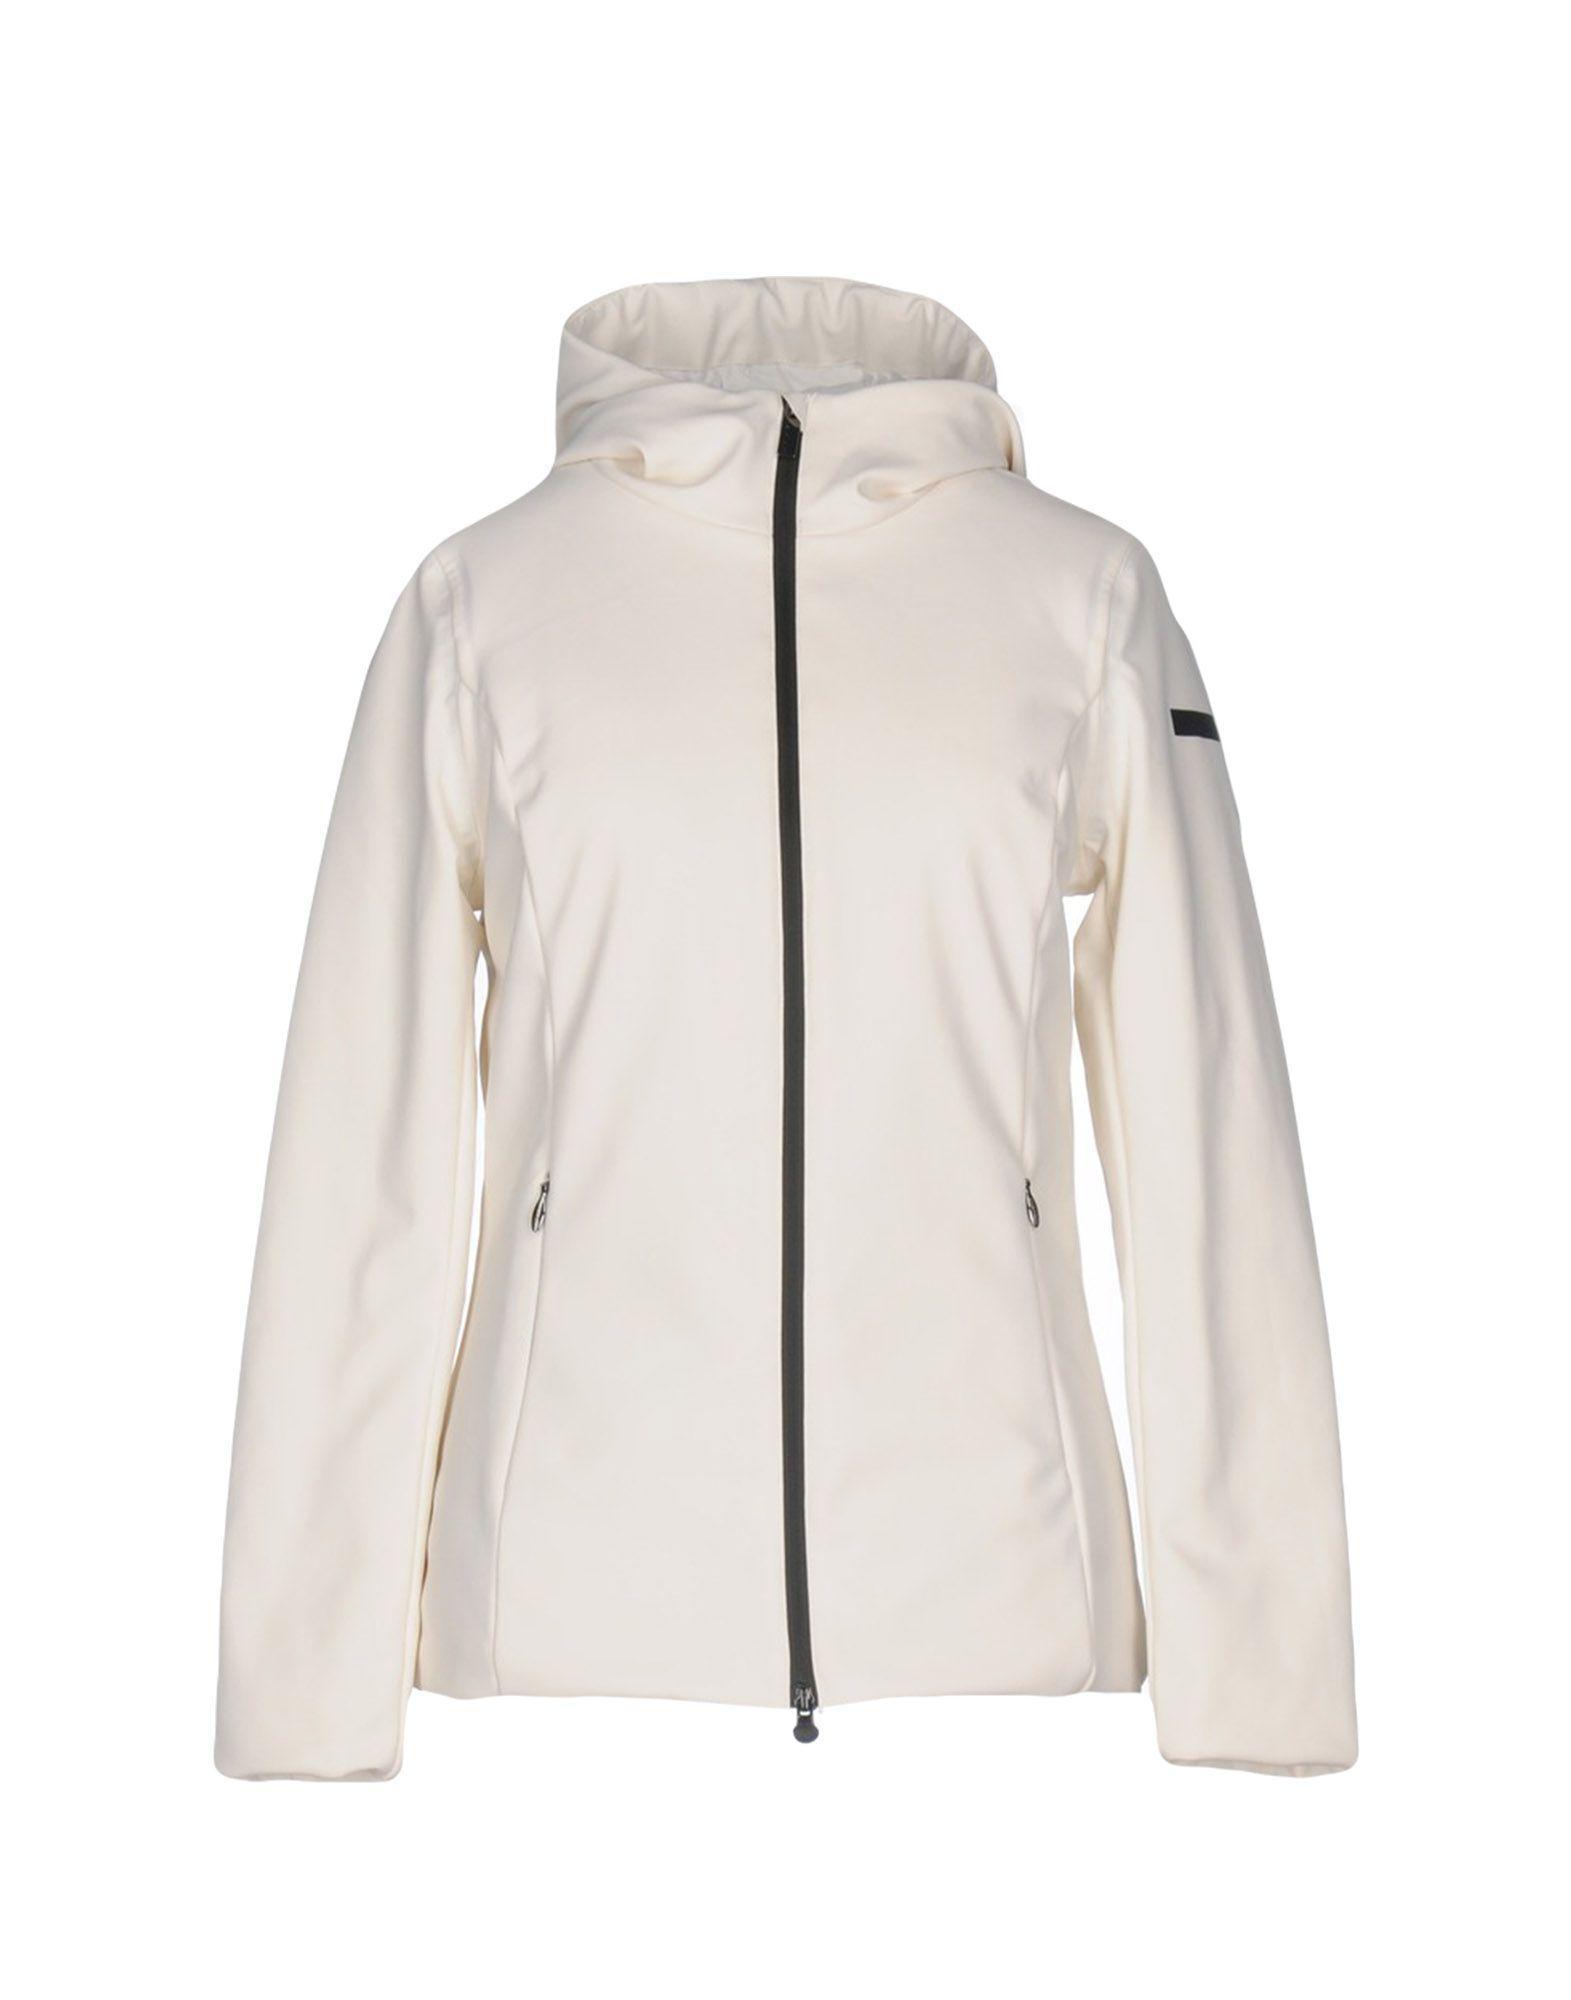 Rrd Down Jacket In White